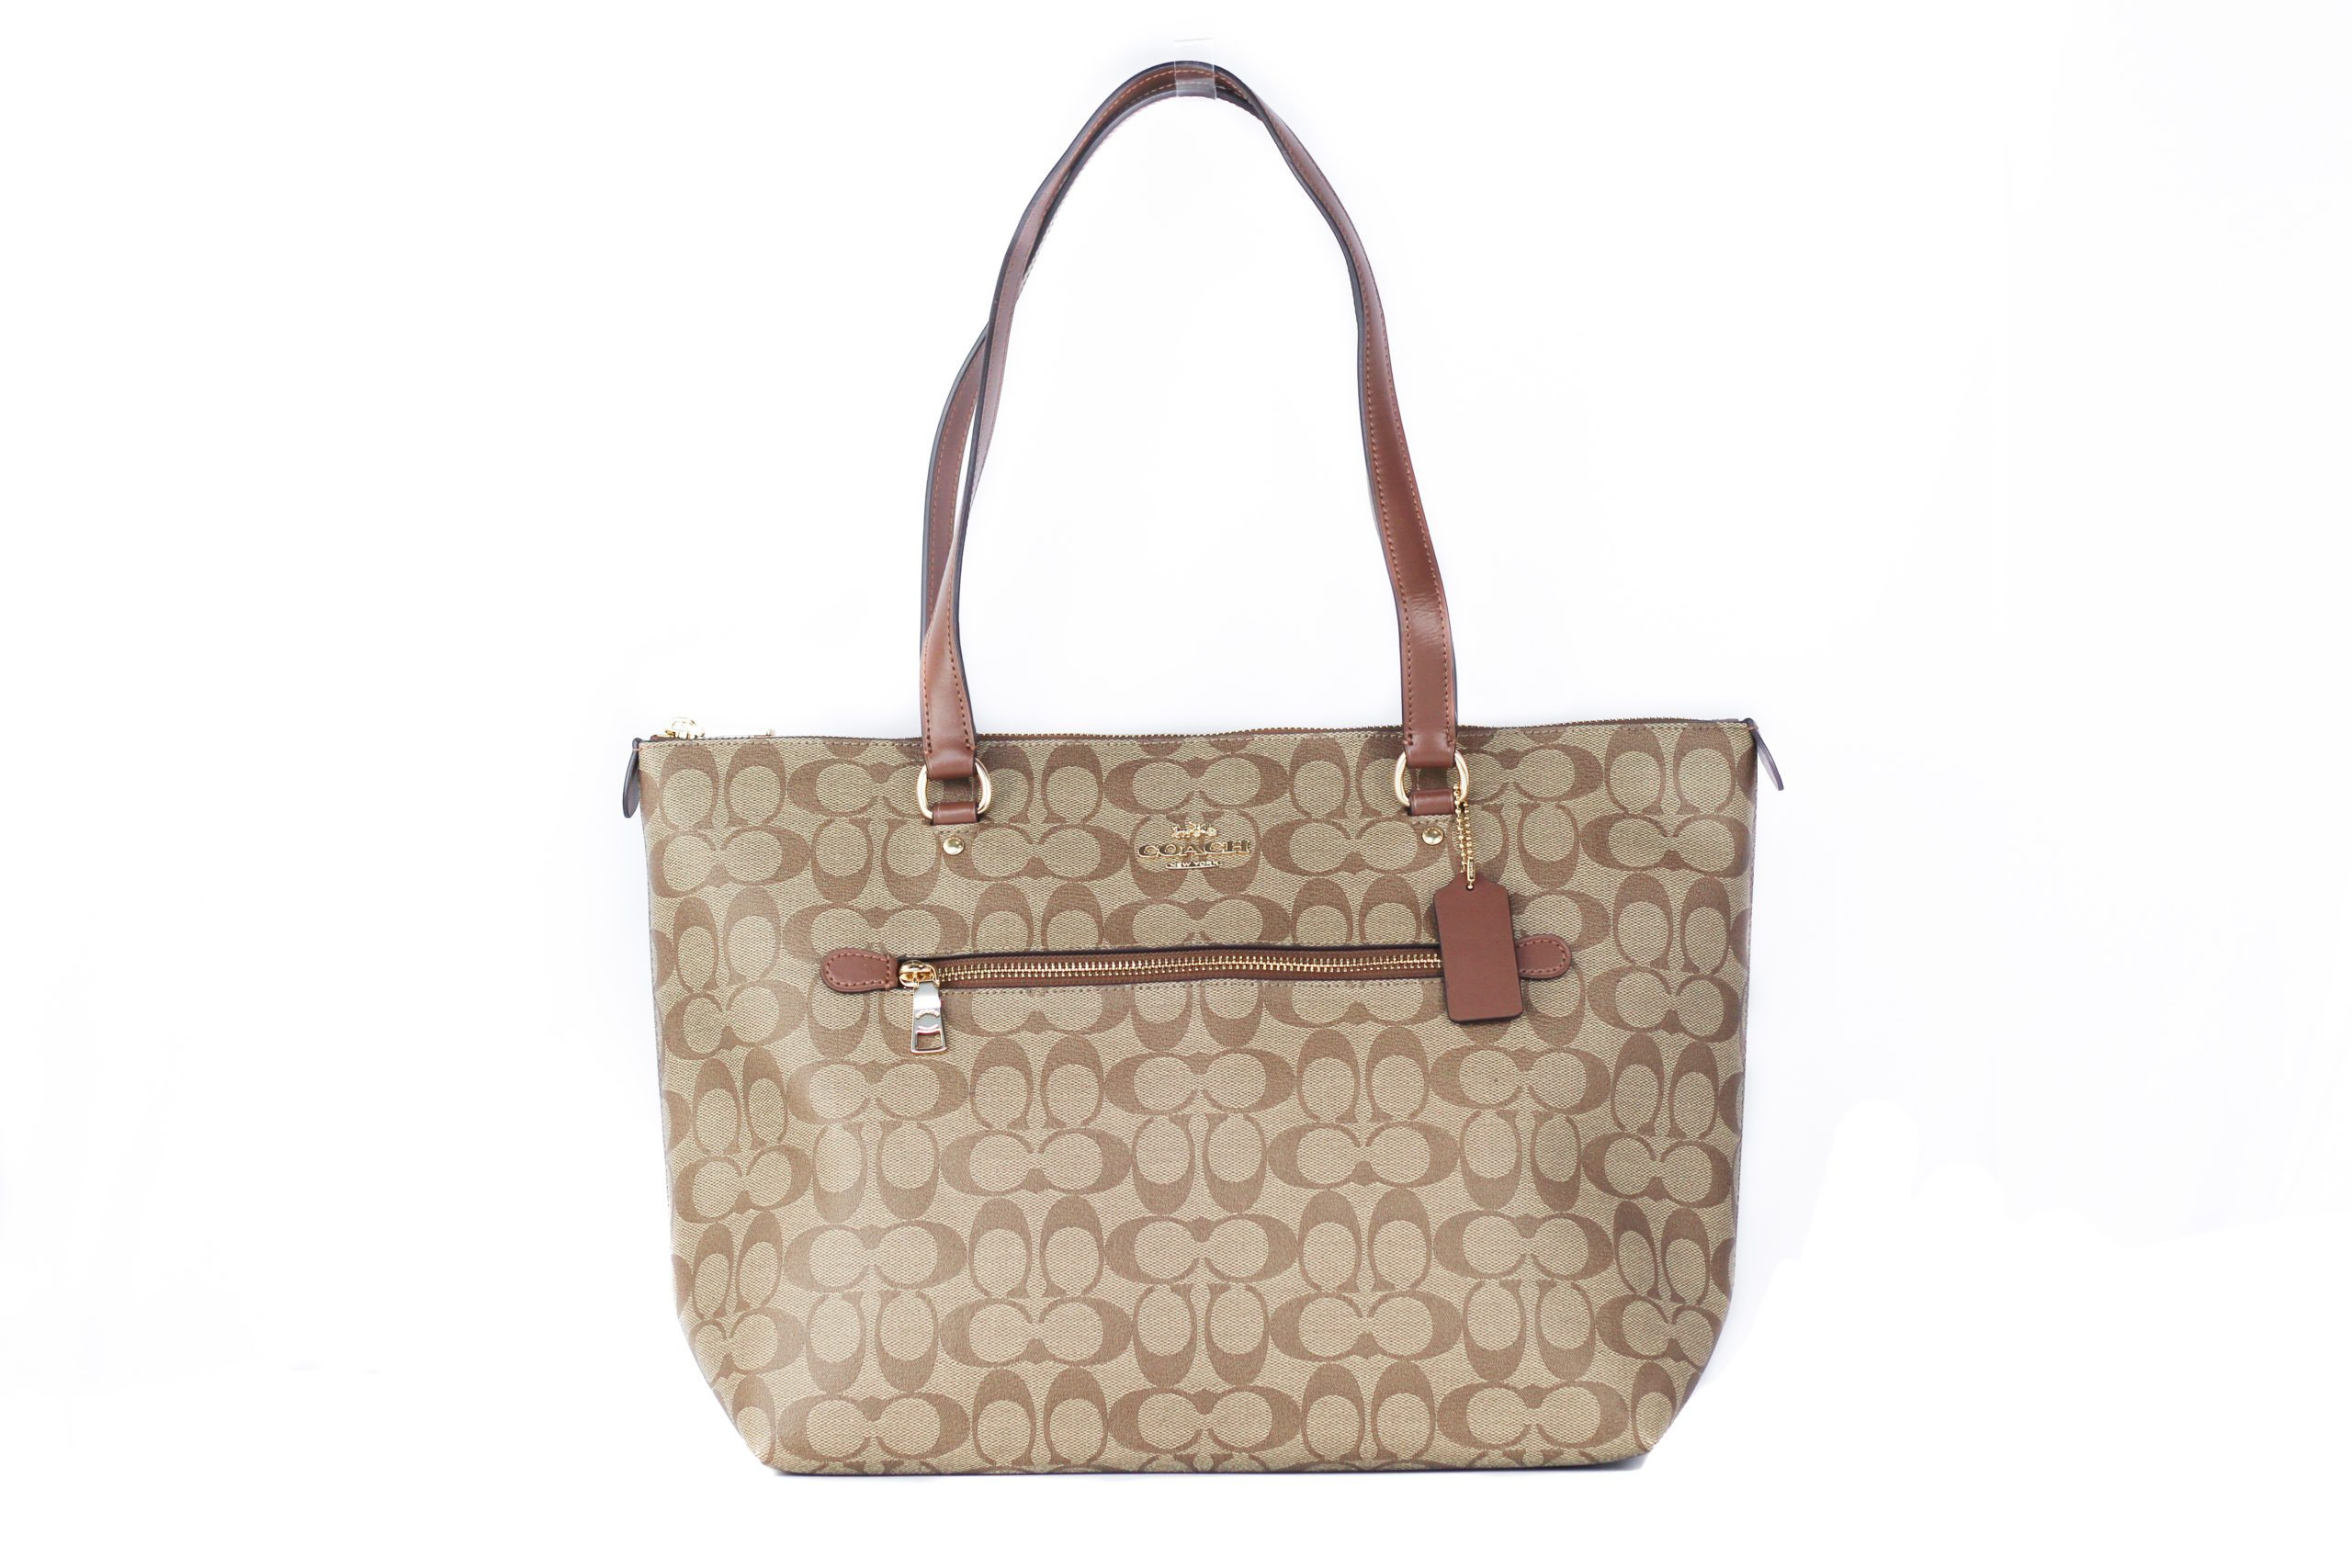 COACH Women's Canvas Leather Tote Bag Khaki 57416